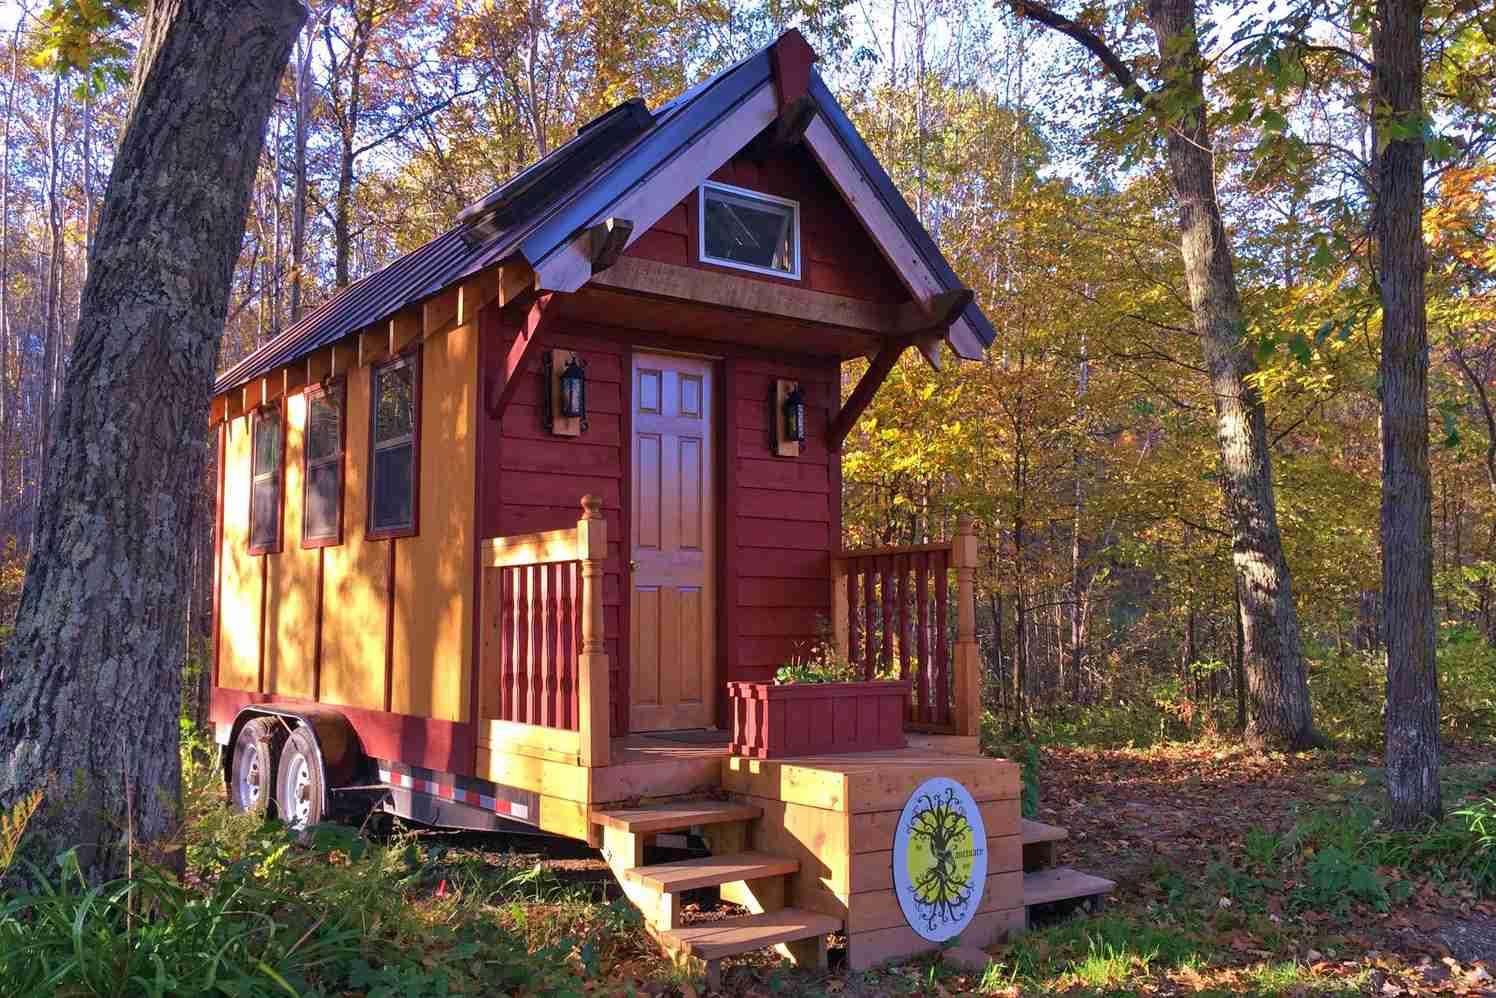 The Sanctuary Minnesota tiny house community